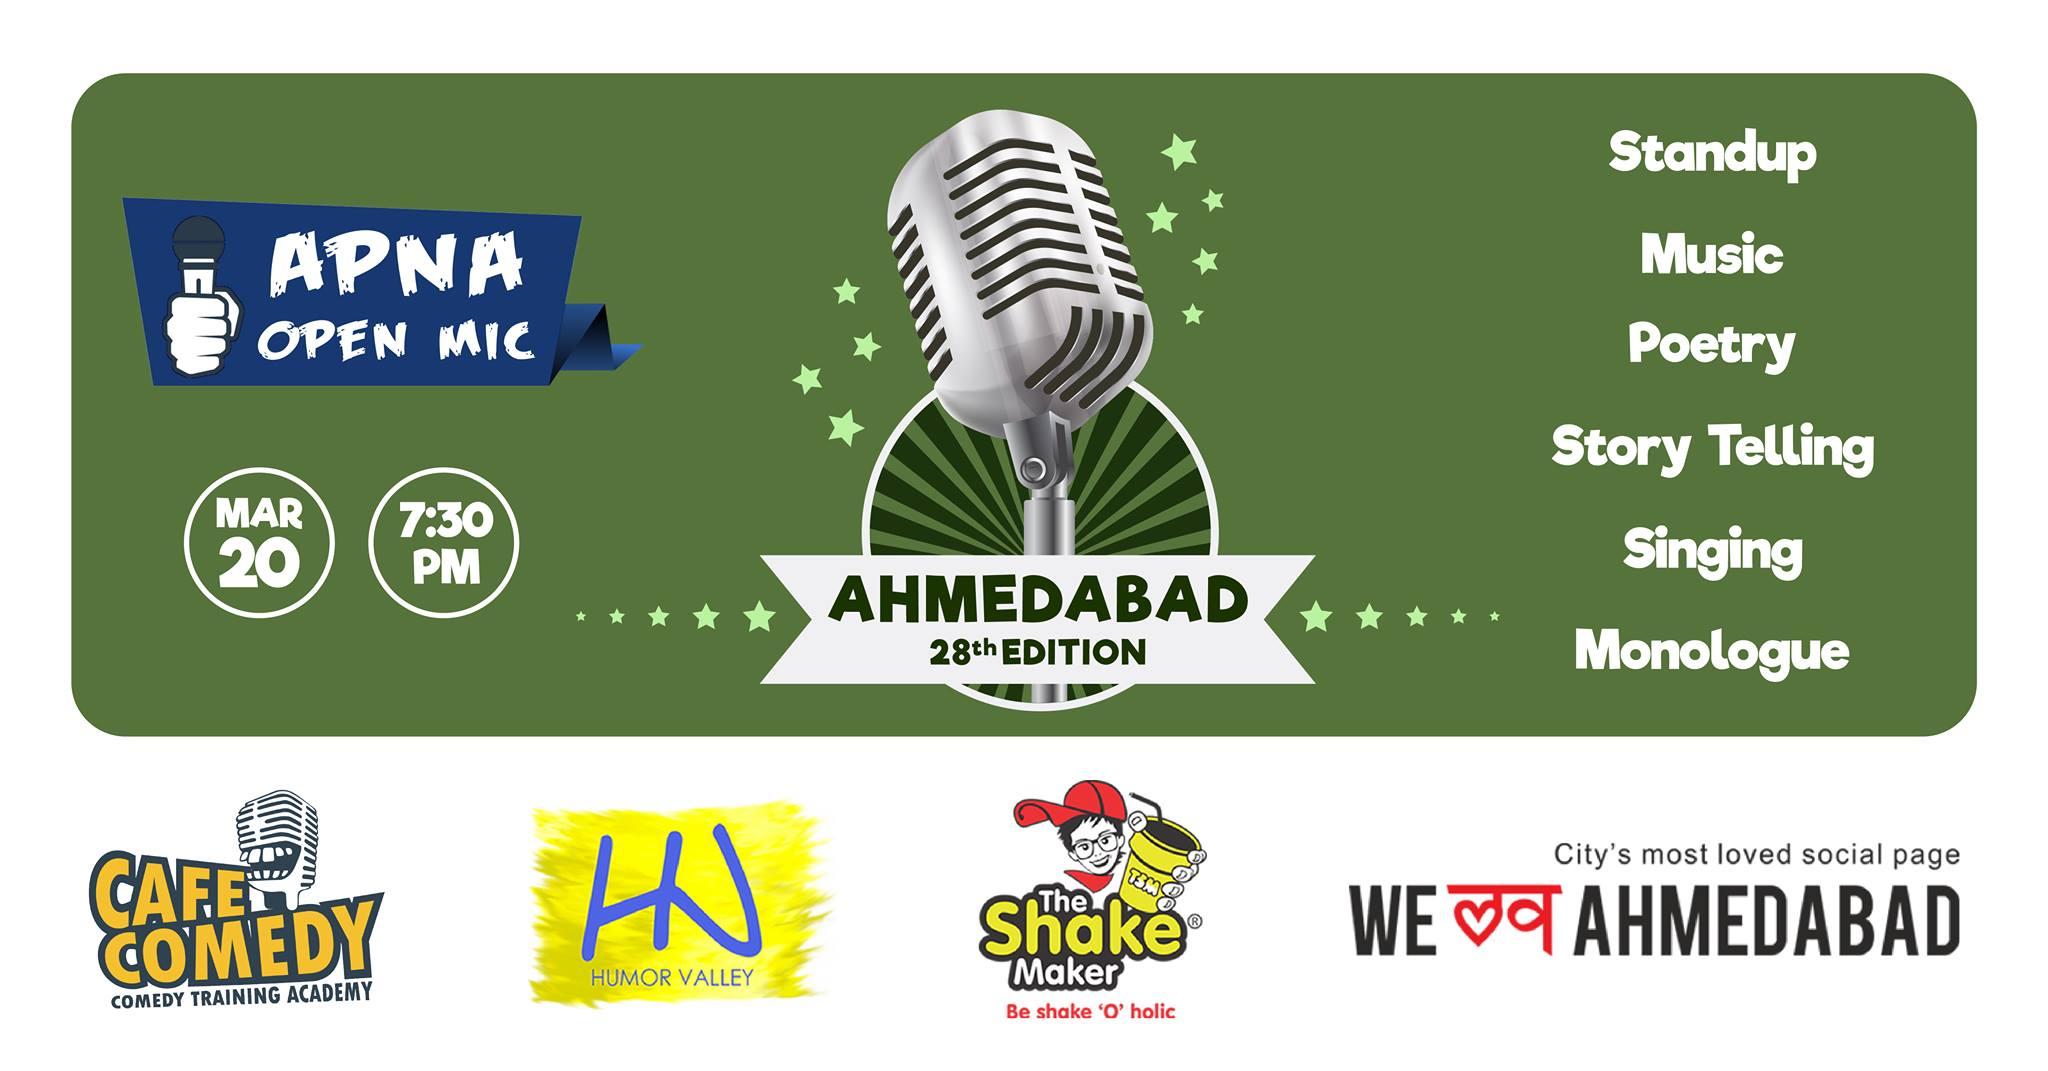 https://creativeyatra.com/wp-content/uploads/2020/03/Apna-Open-Mic-Ahmedabad-28th-Edition.jpg